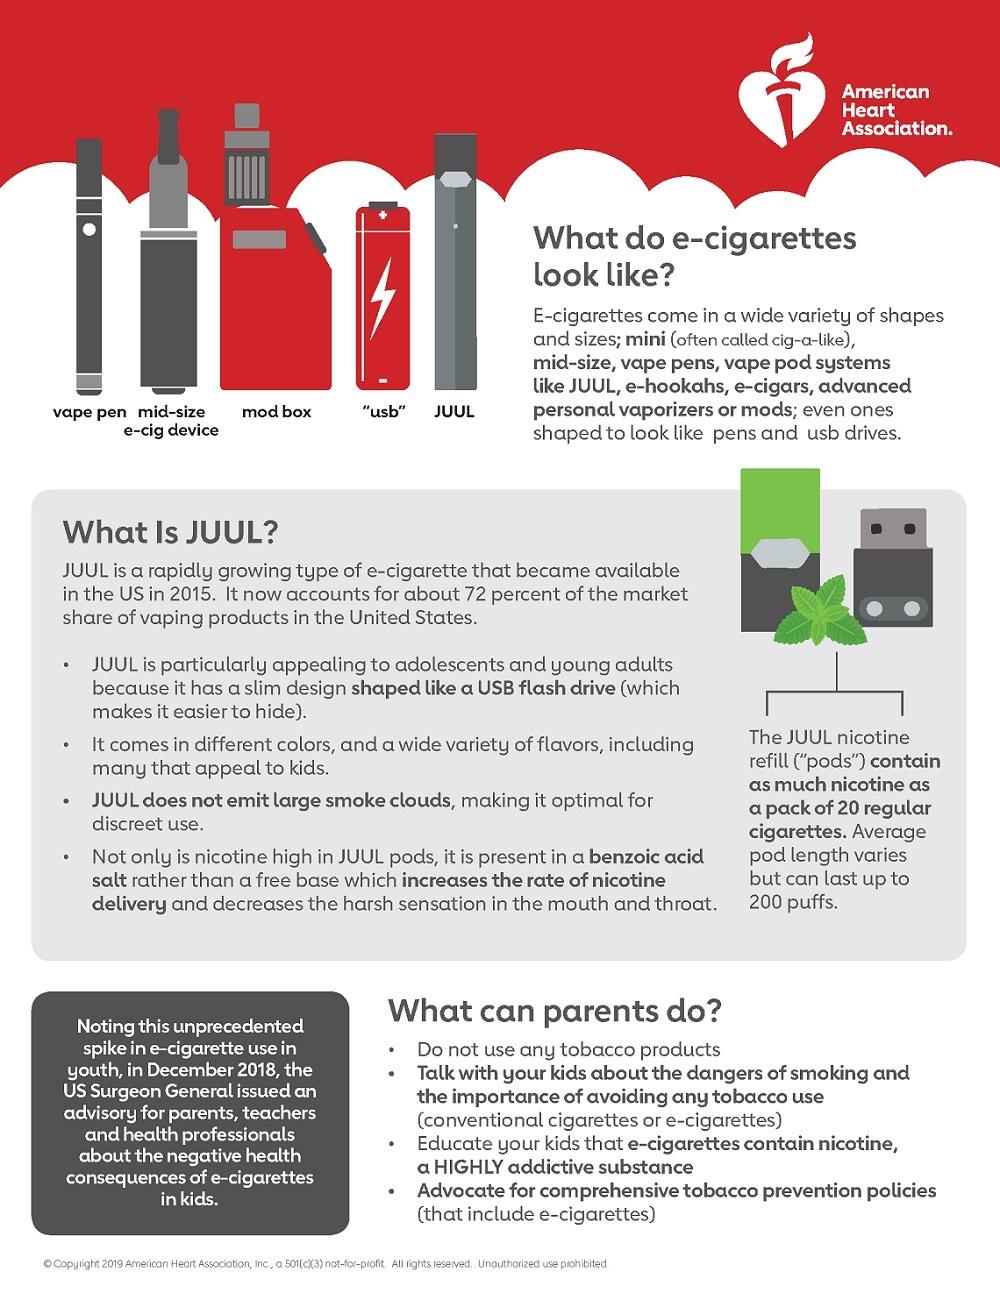 What do e-cigarettes look like?